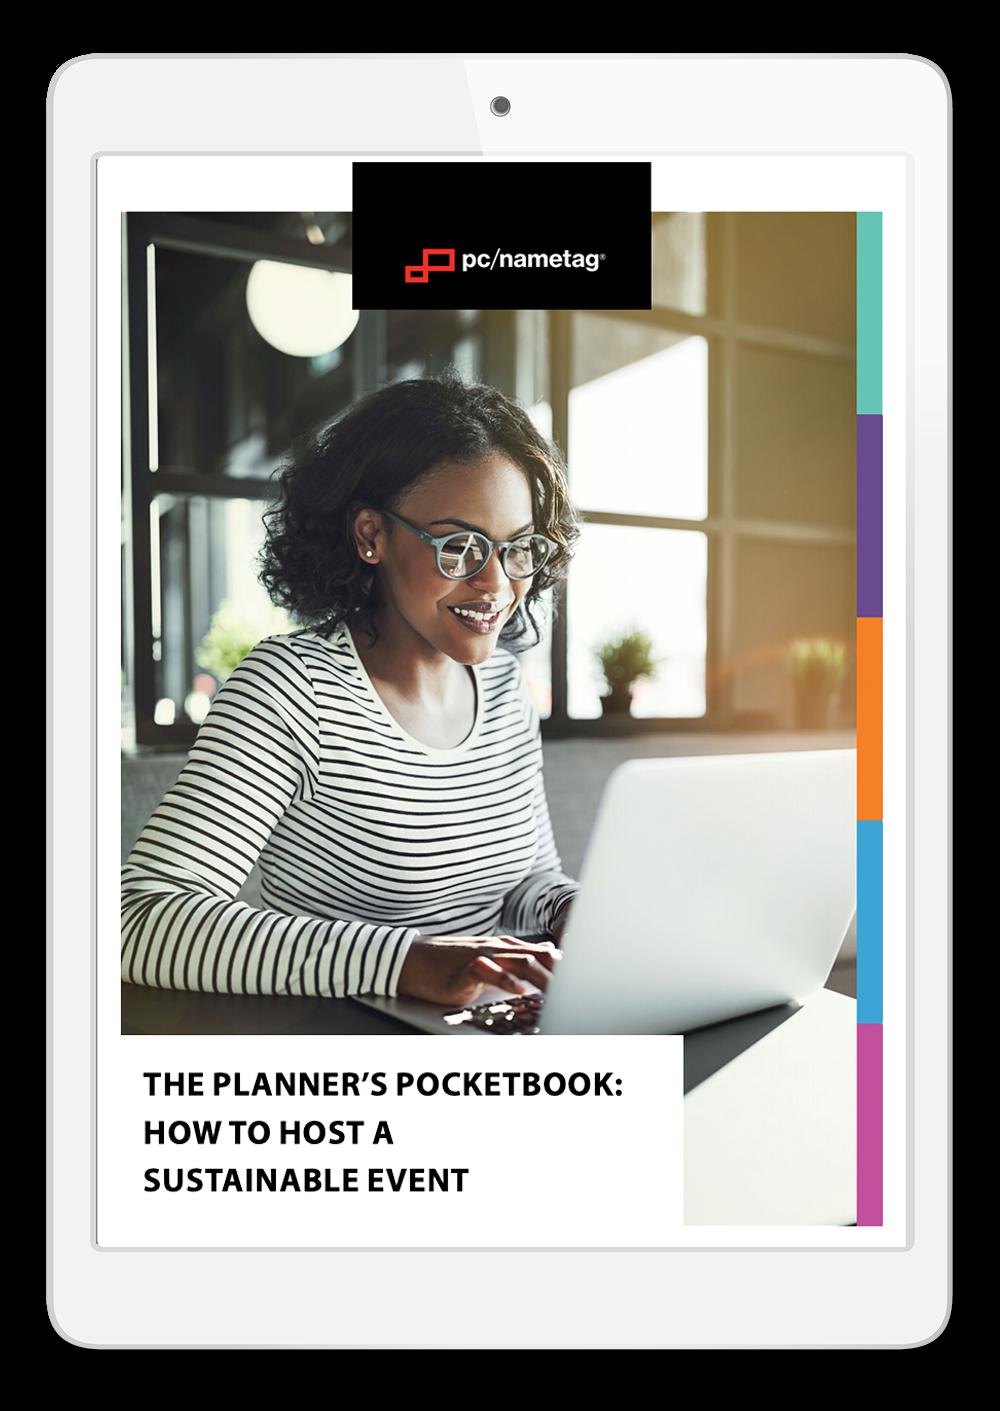 Sustainable Event Ebook in iPad